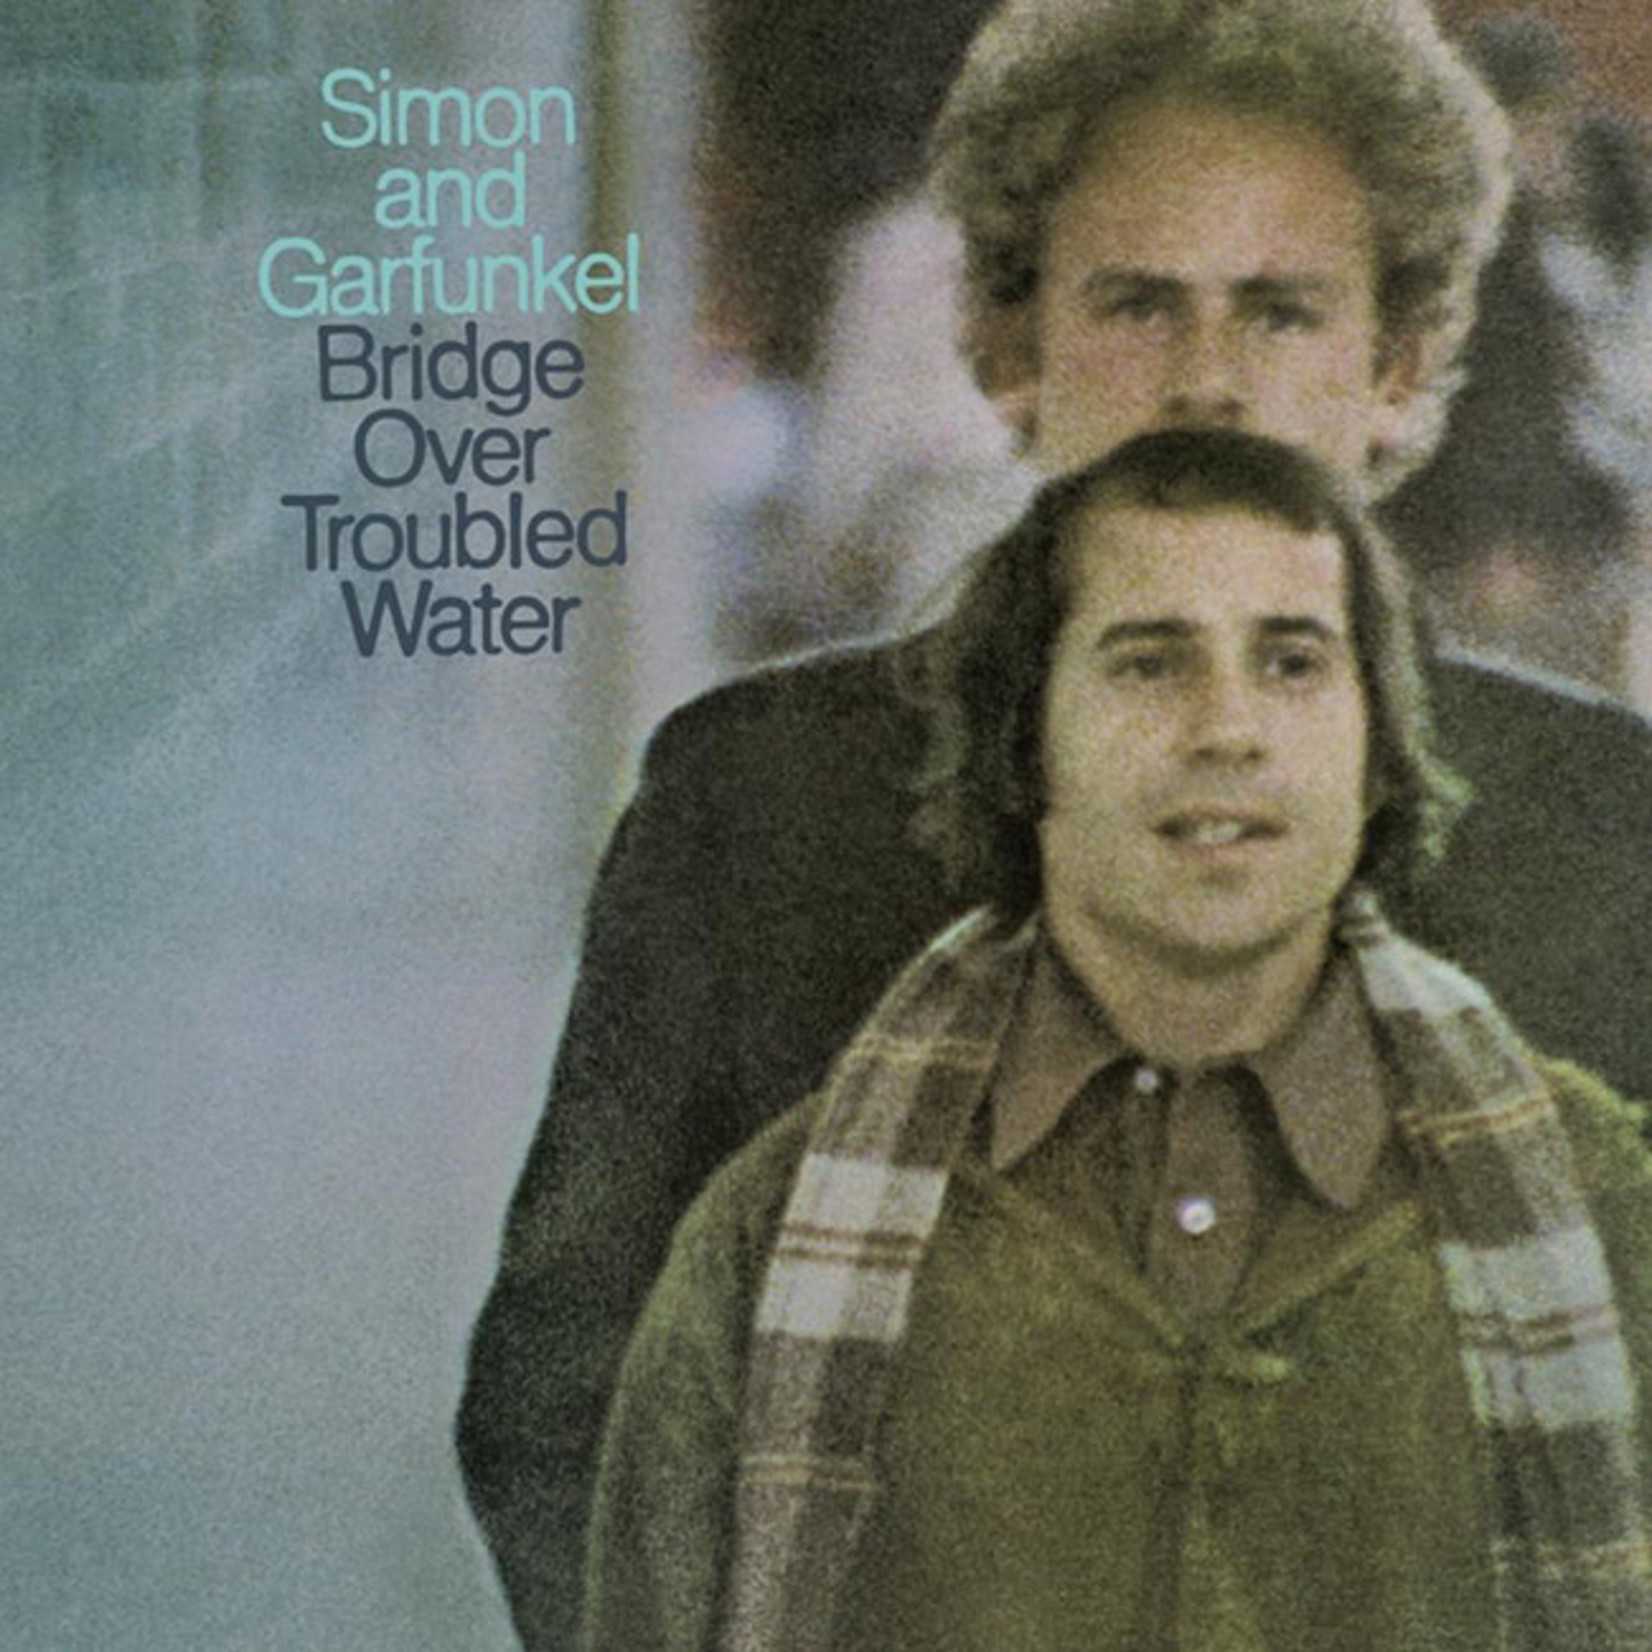 [New] Simon & Garfunkel: Bridge Over Troubled Water